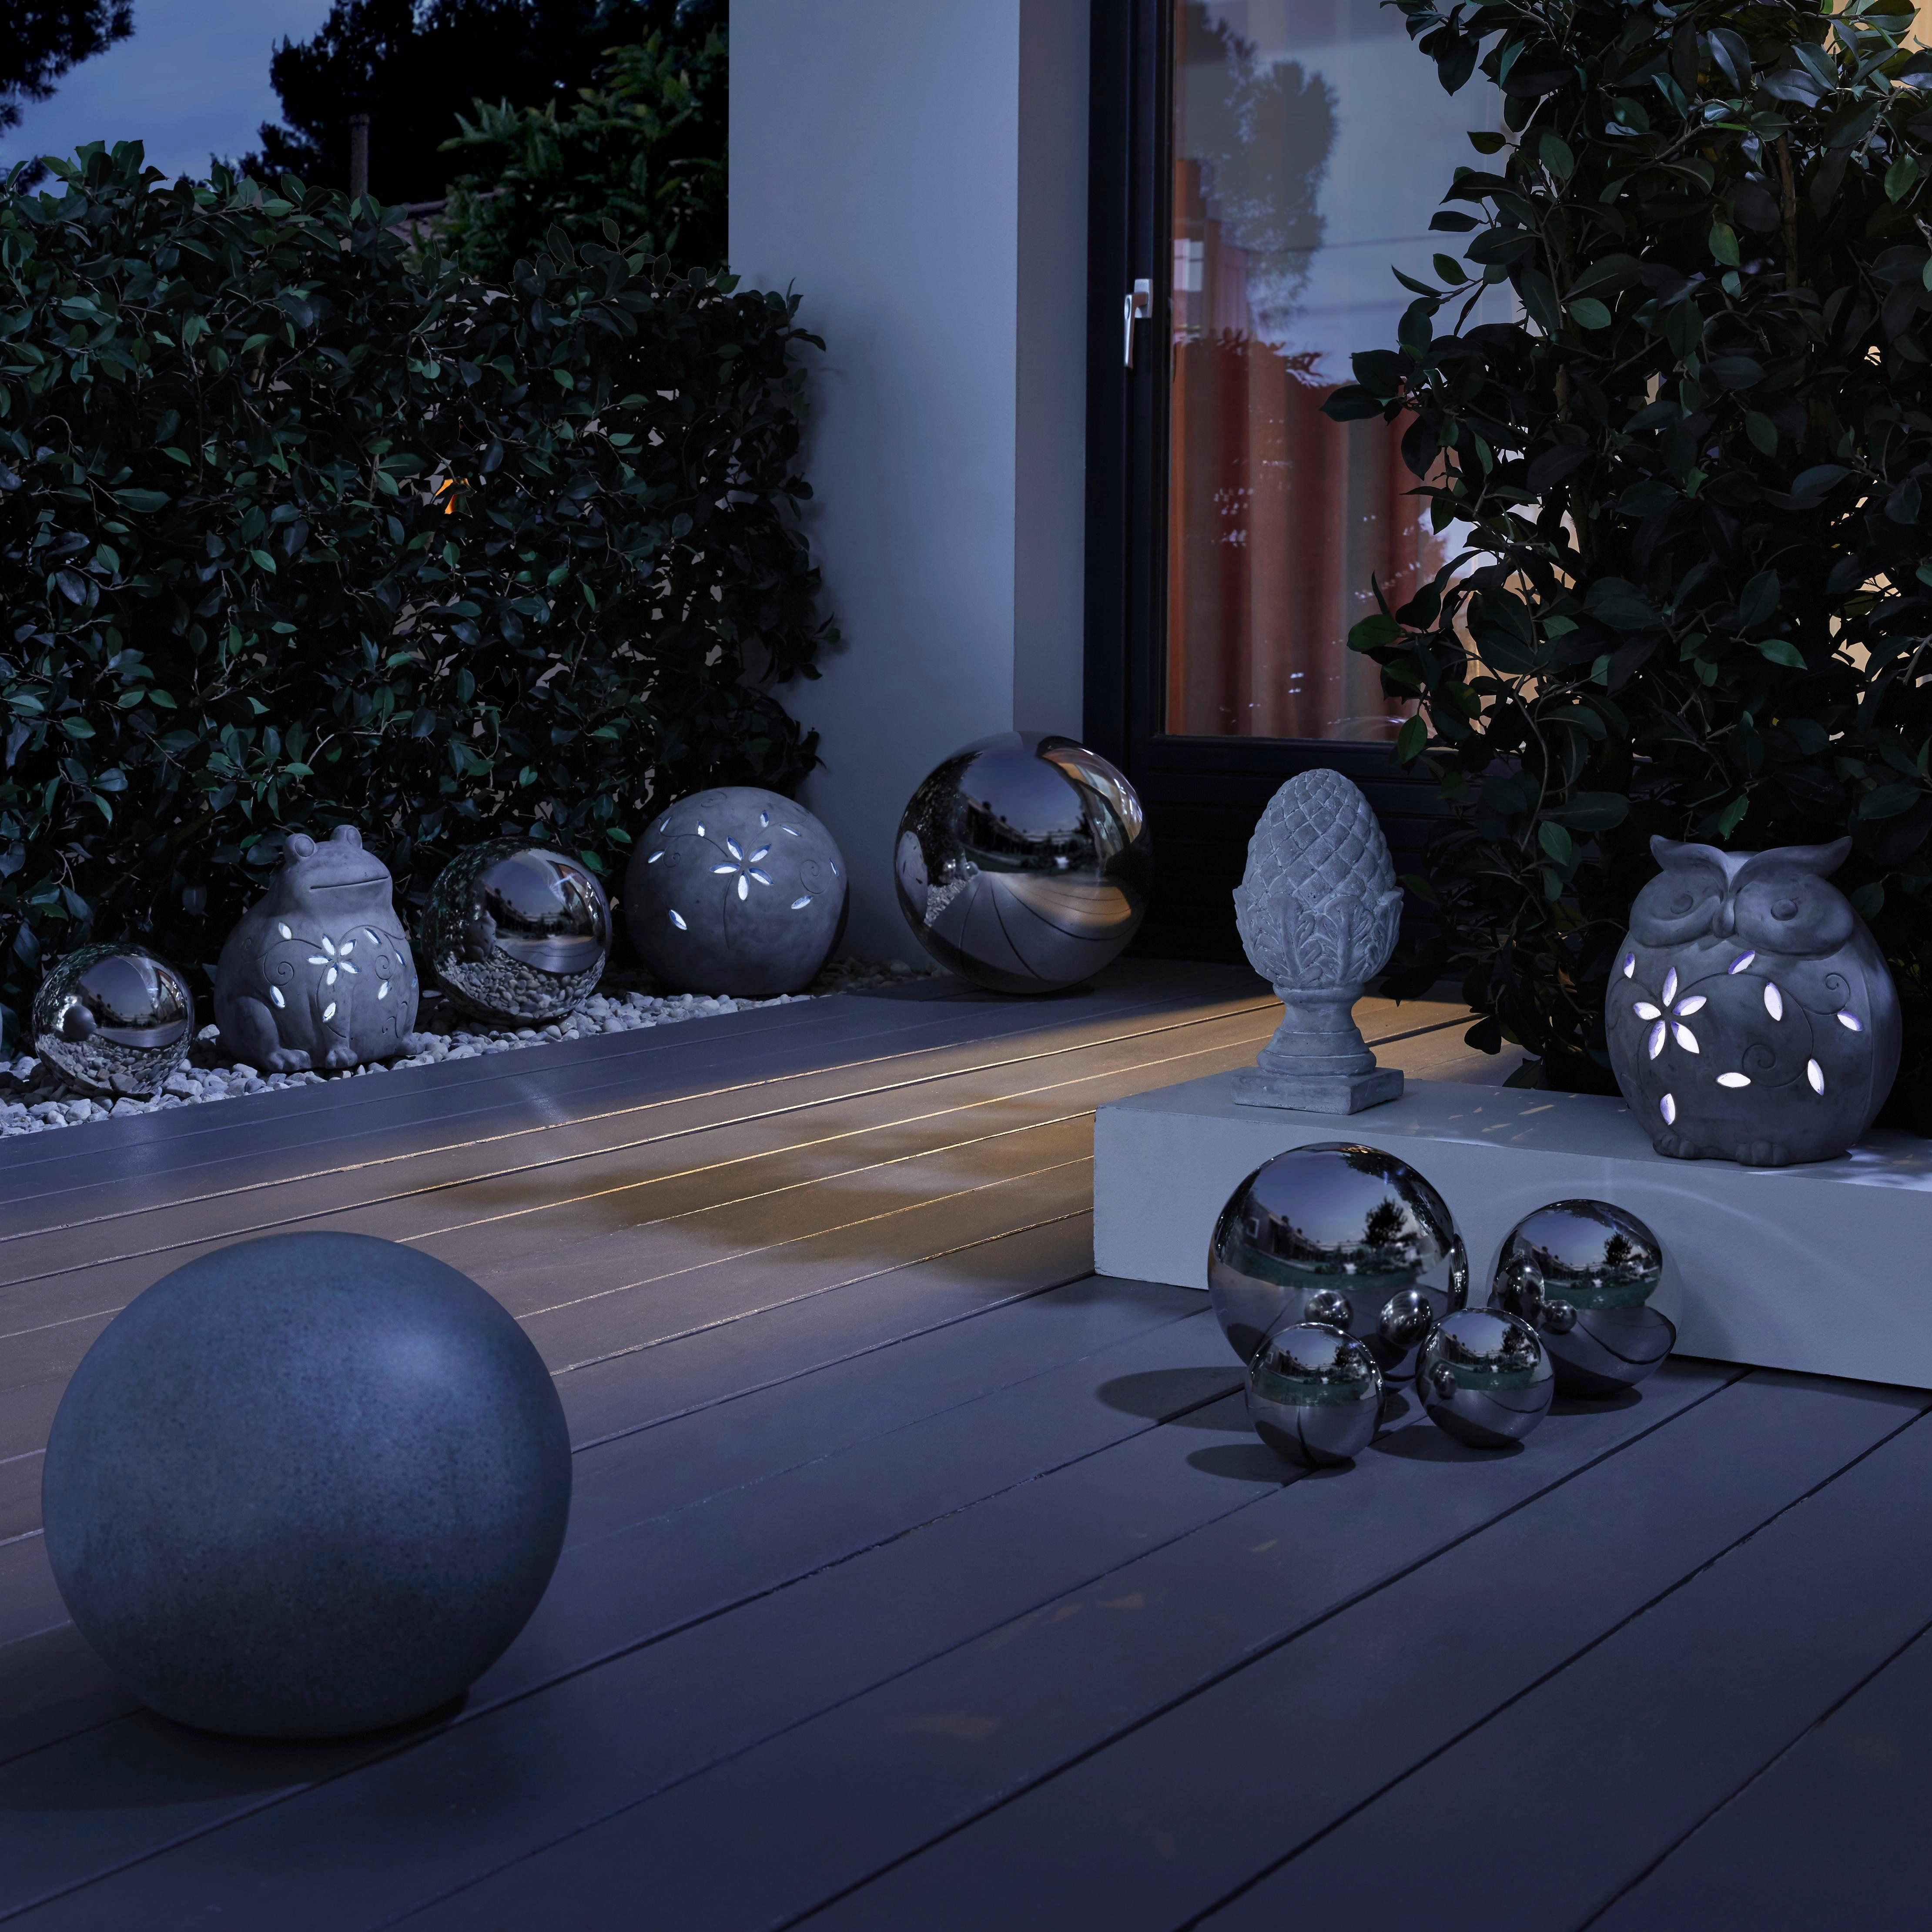 Dekokugel 20 cm Mia - Silberfarben, Metall (20cm) - MÖMAX modern living